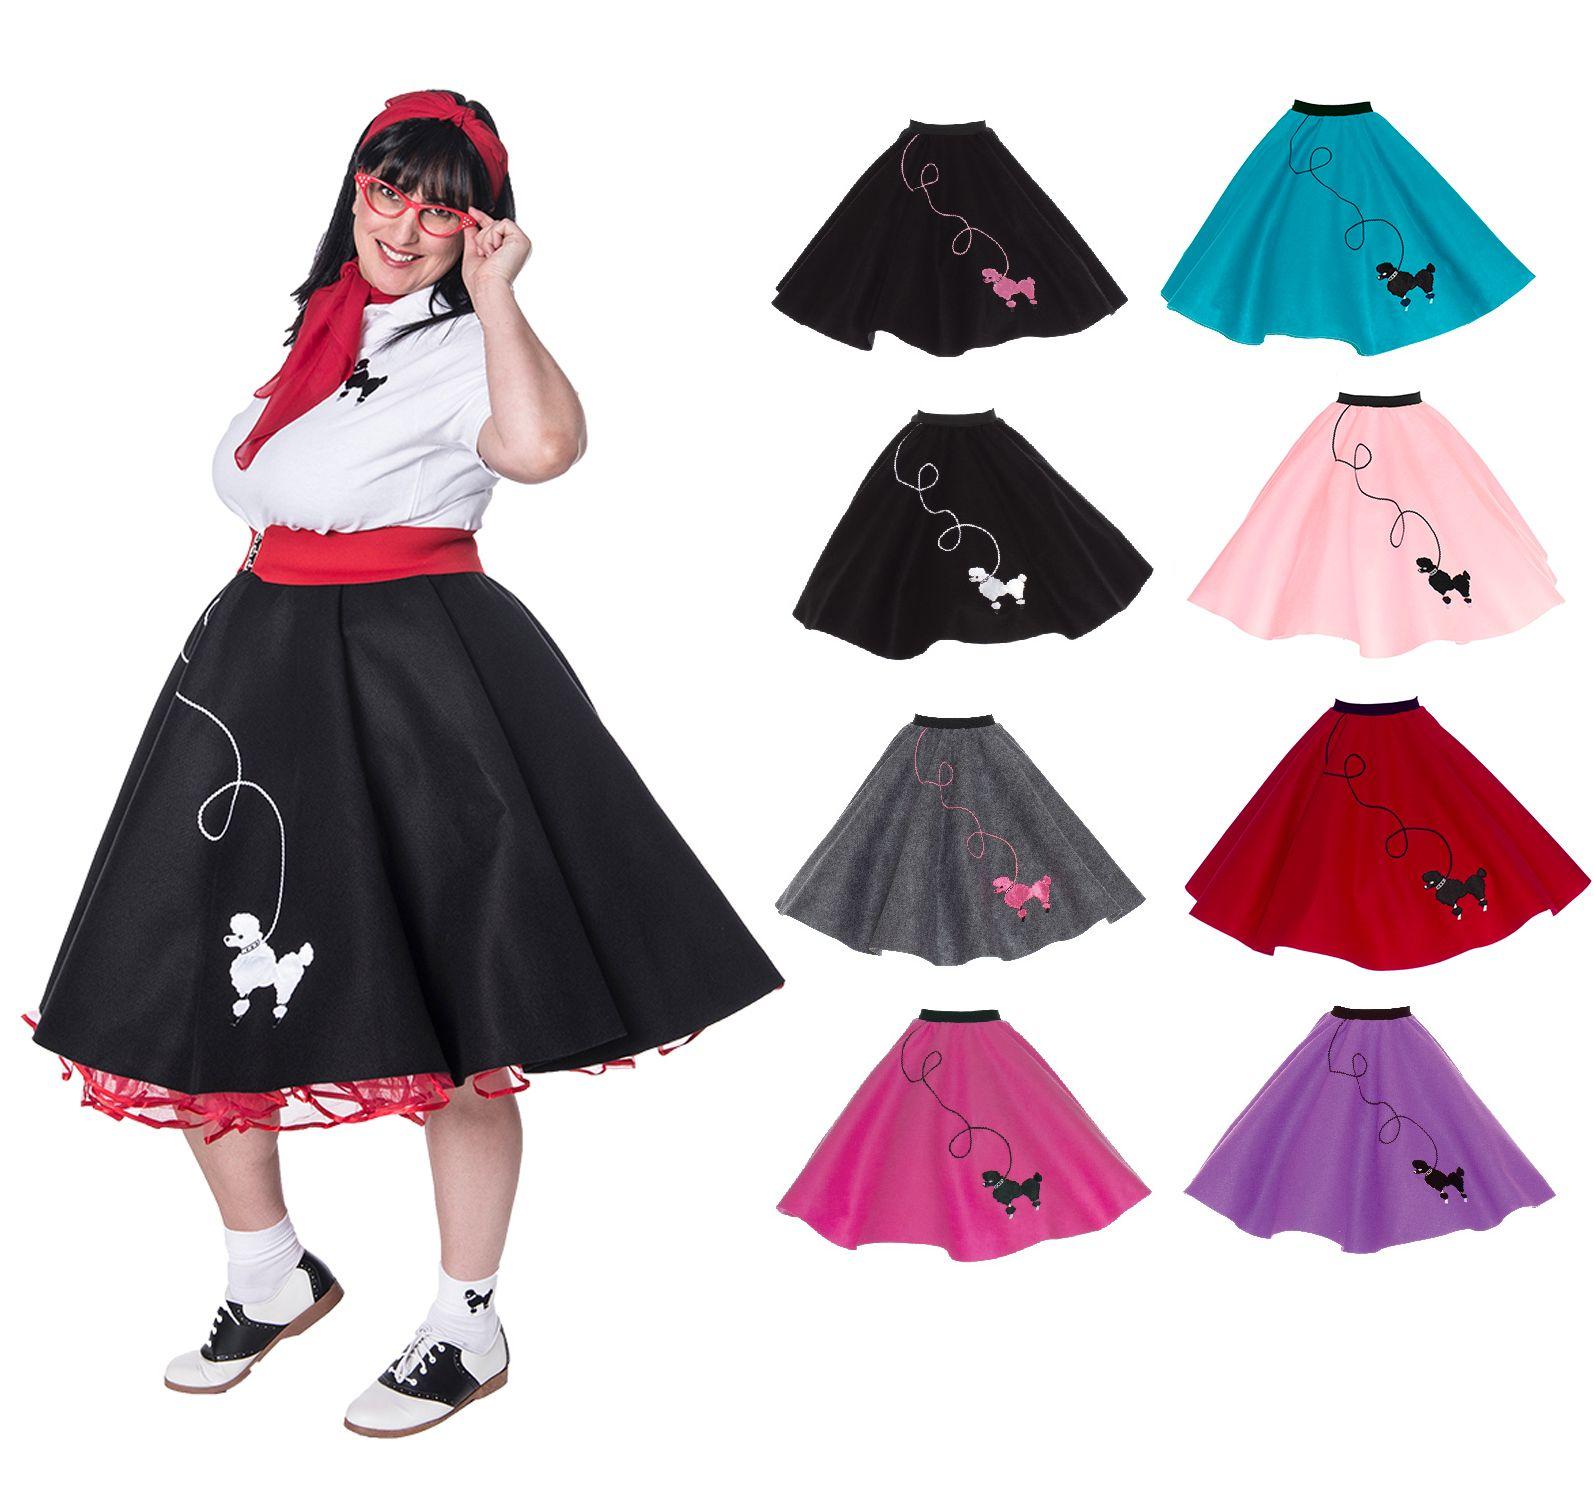 K127 Ladies 1950s Grease Poodle Rock and Roll Sock Hop Pink Ladies Dress Costume